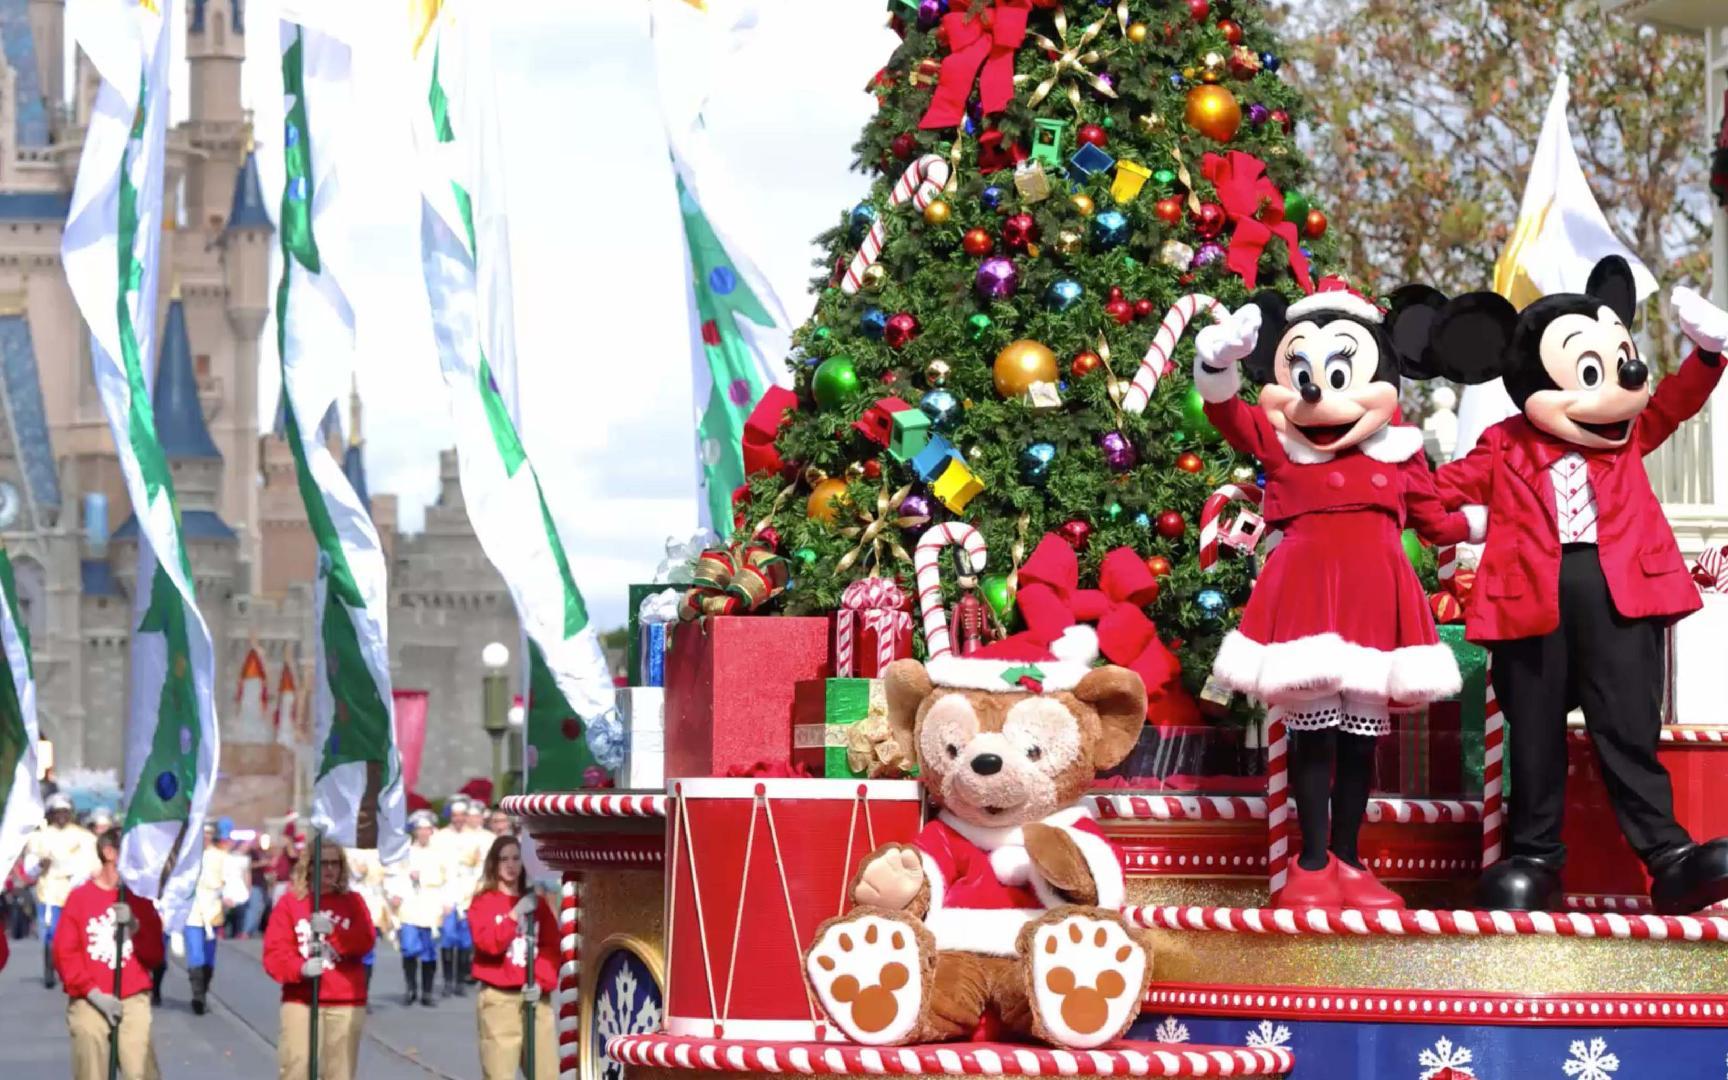 Disney world parade christmas 2019 gift